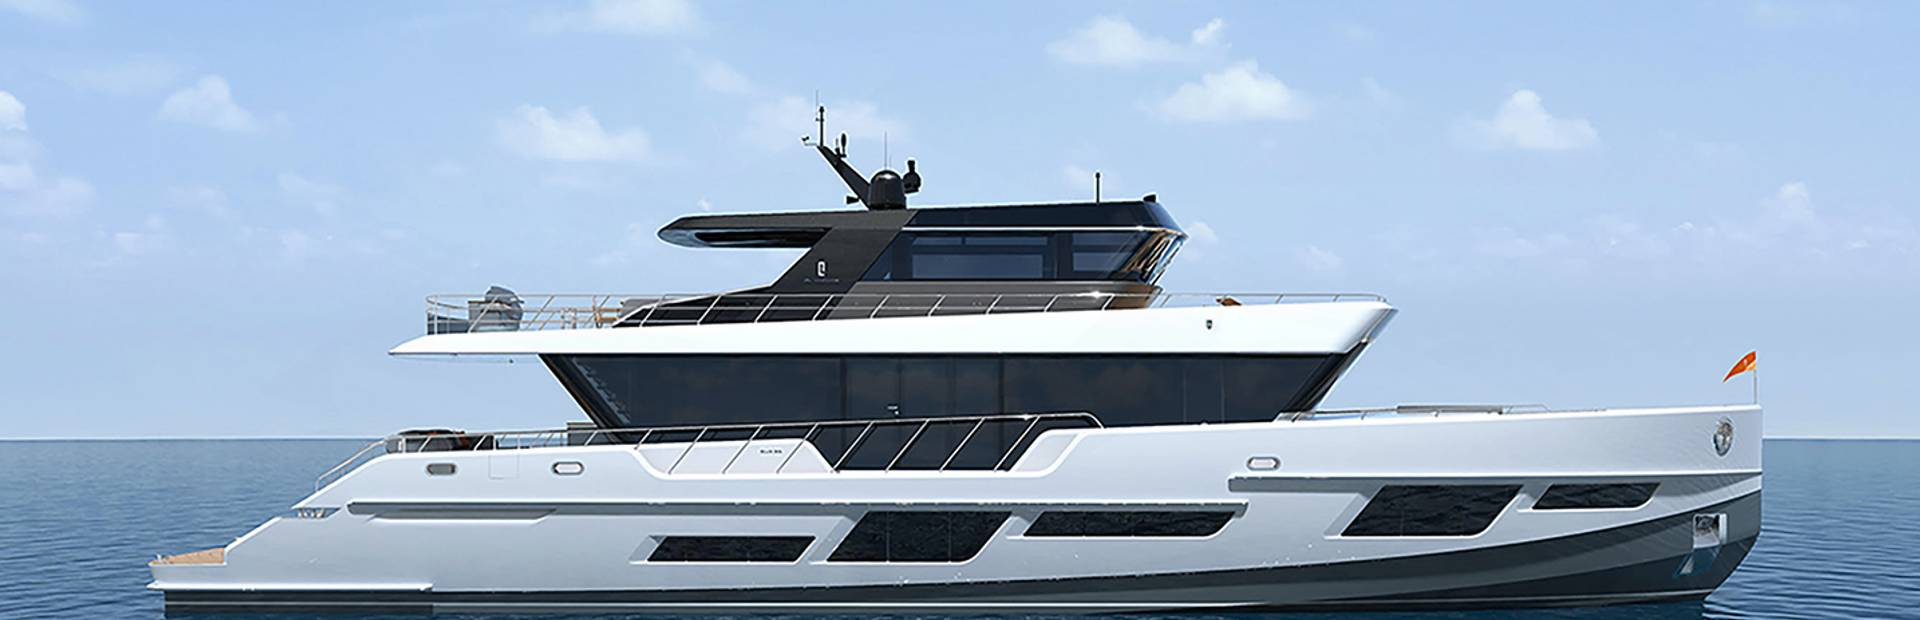 CLX96 Yacht Charter